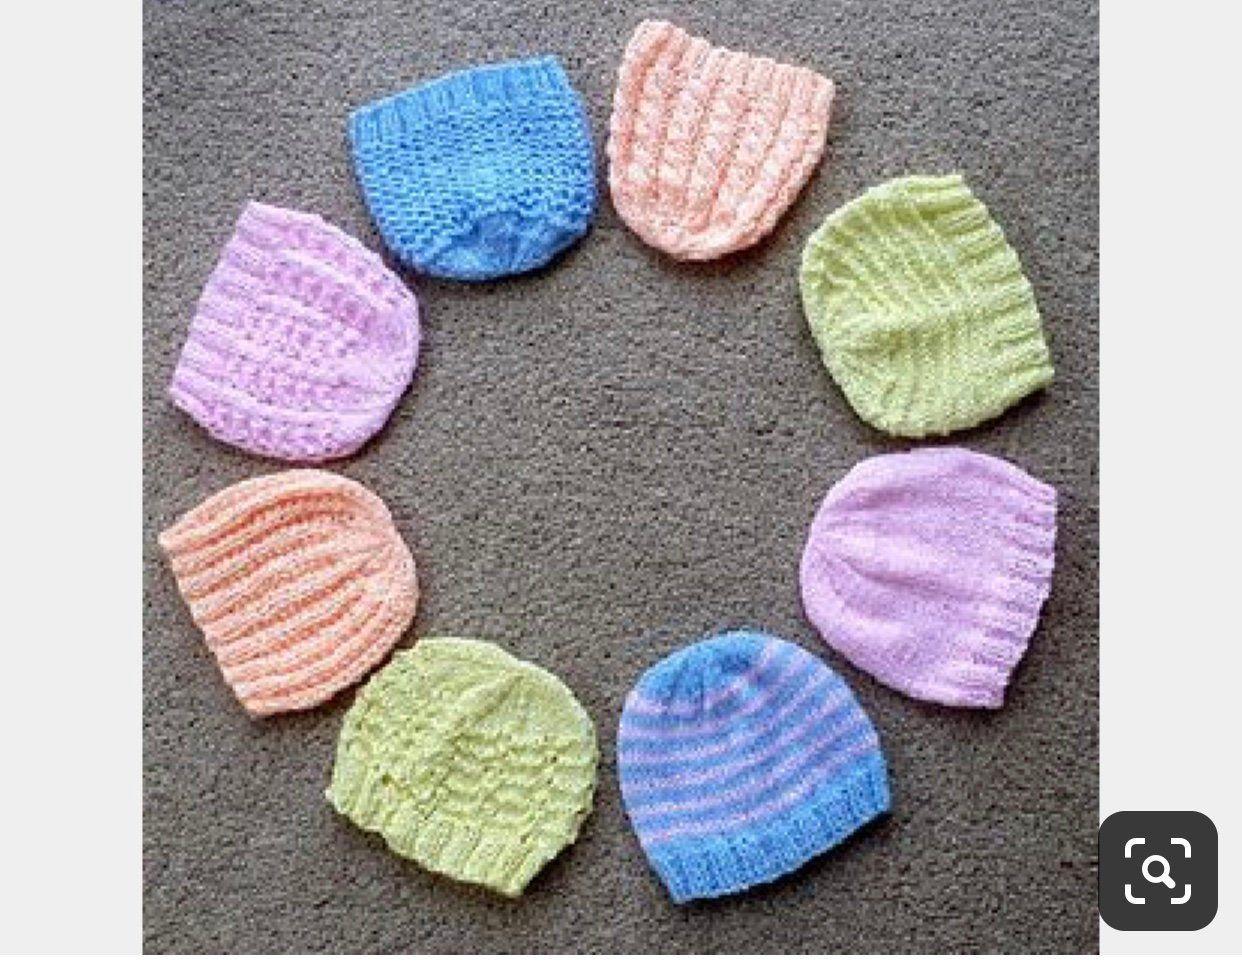 Preemie Hats Bulk Nicu Donation Micro Preemie Hats Hospital